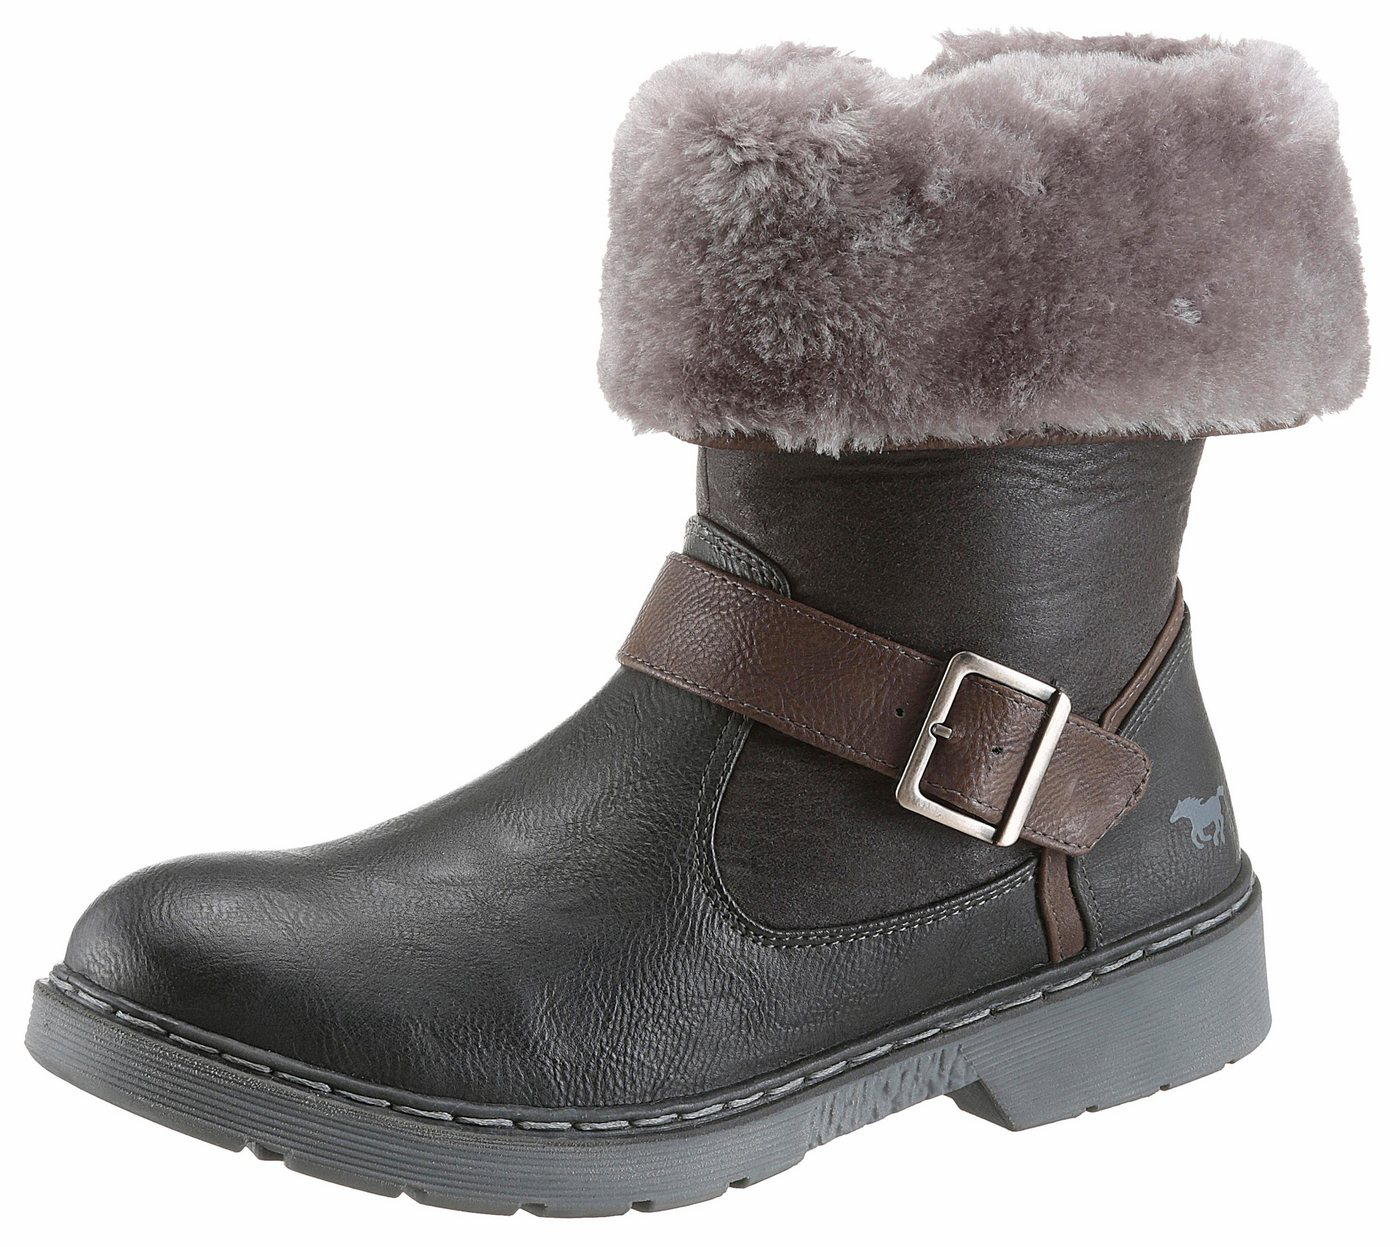 Mustang Shoes Winterstiefelette, hoch- und umgeschlagen tragbar   Schuhe > Stiefeletten > Winterstiefeletten   Grau   Mustang Shoes